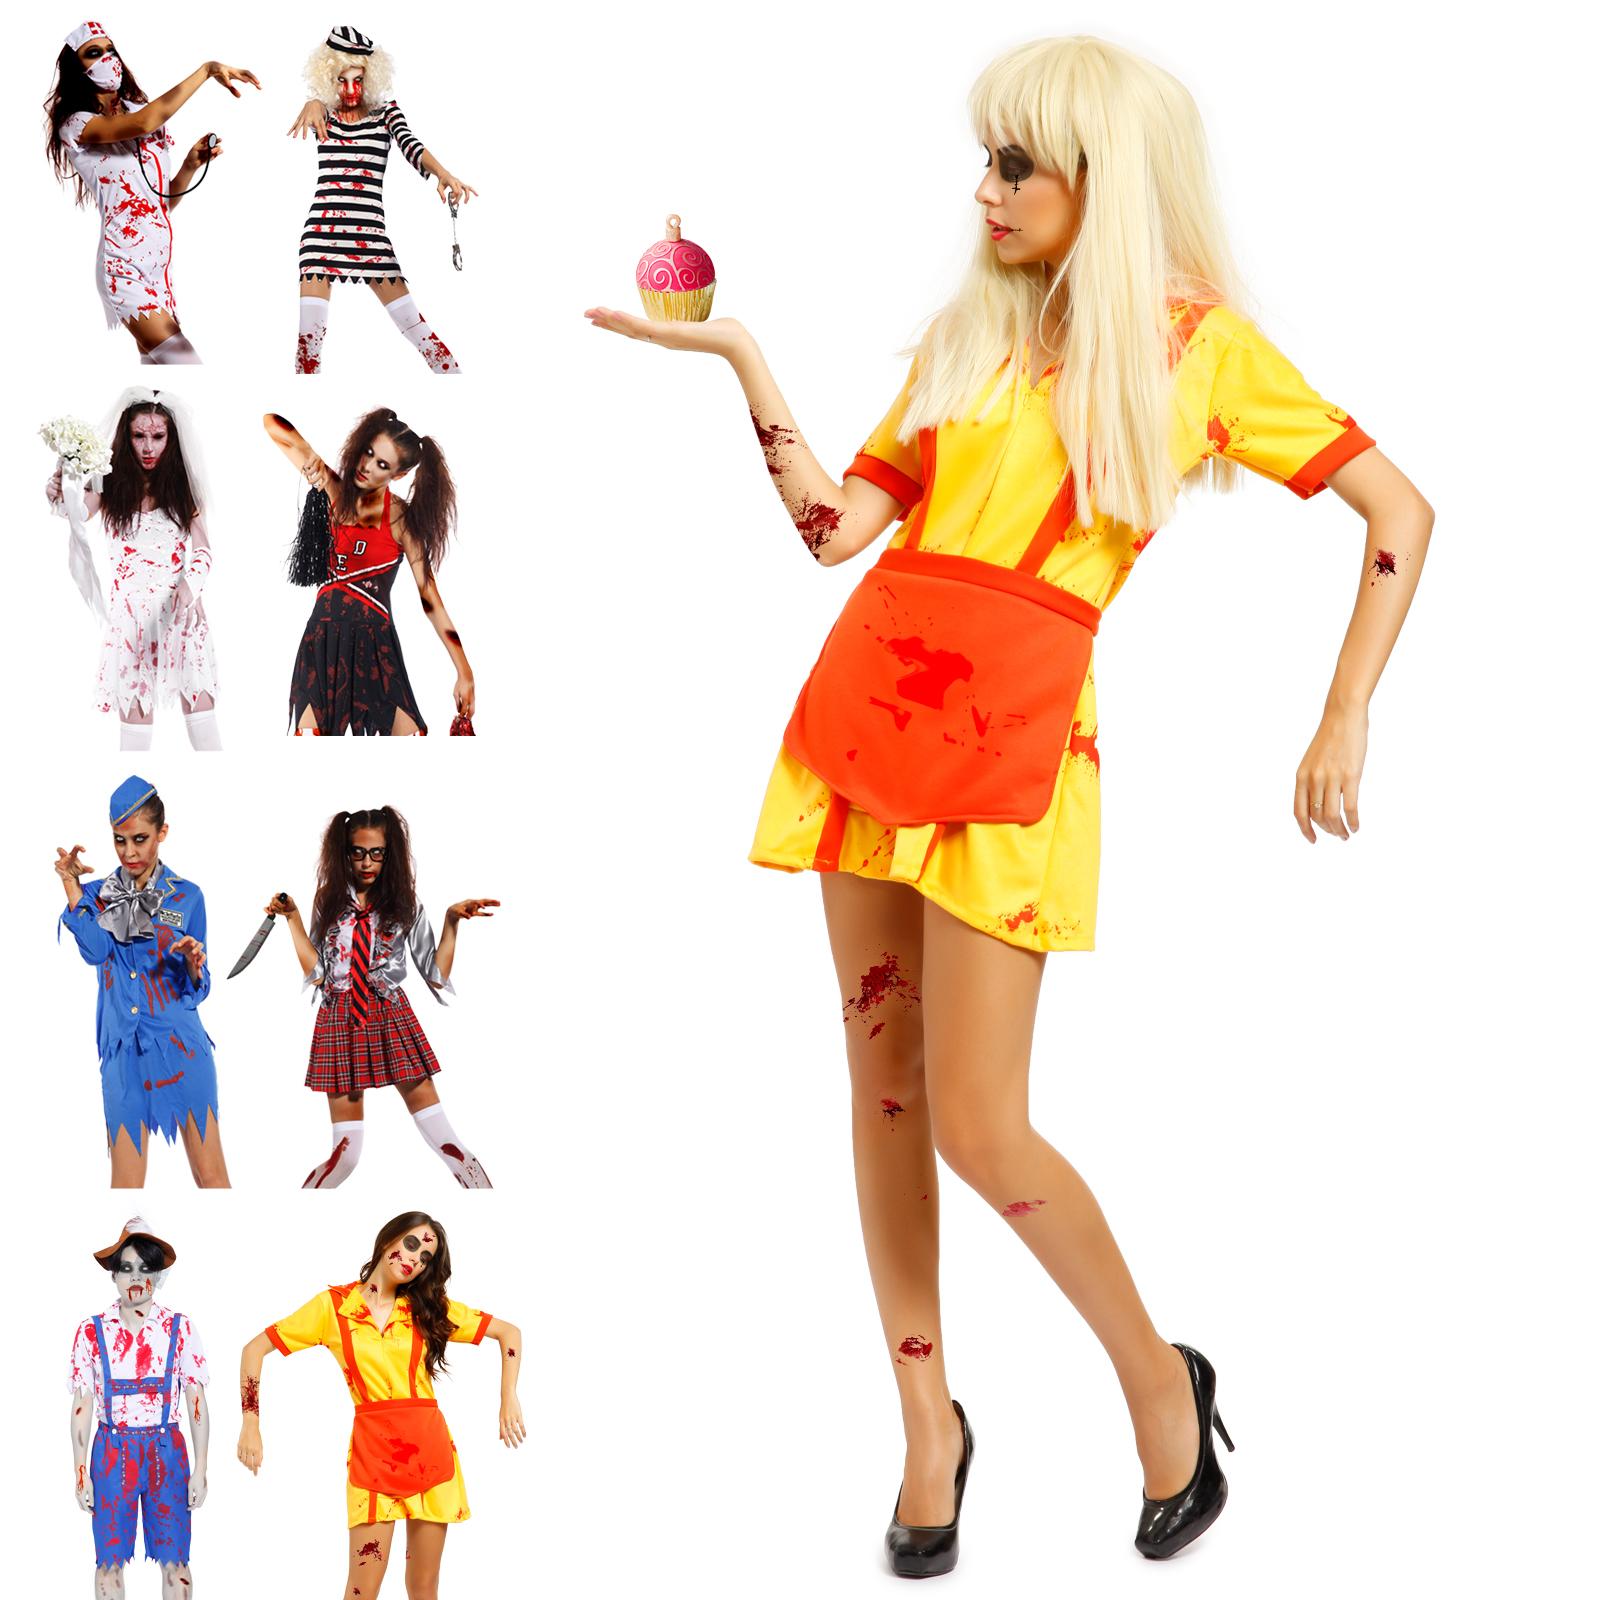 halloween zombie horror kost m damen erwachsene kost m fancy dress f r karneval ebay. Black Bedroom Furniture Sets. Home Design Ideas